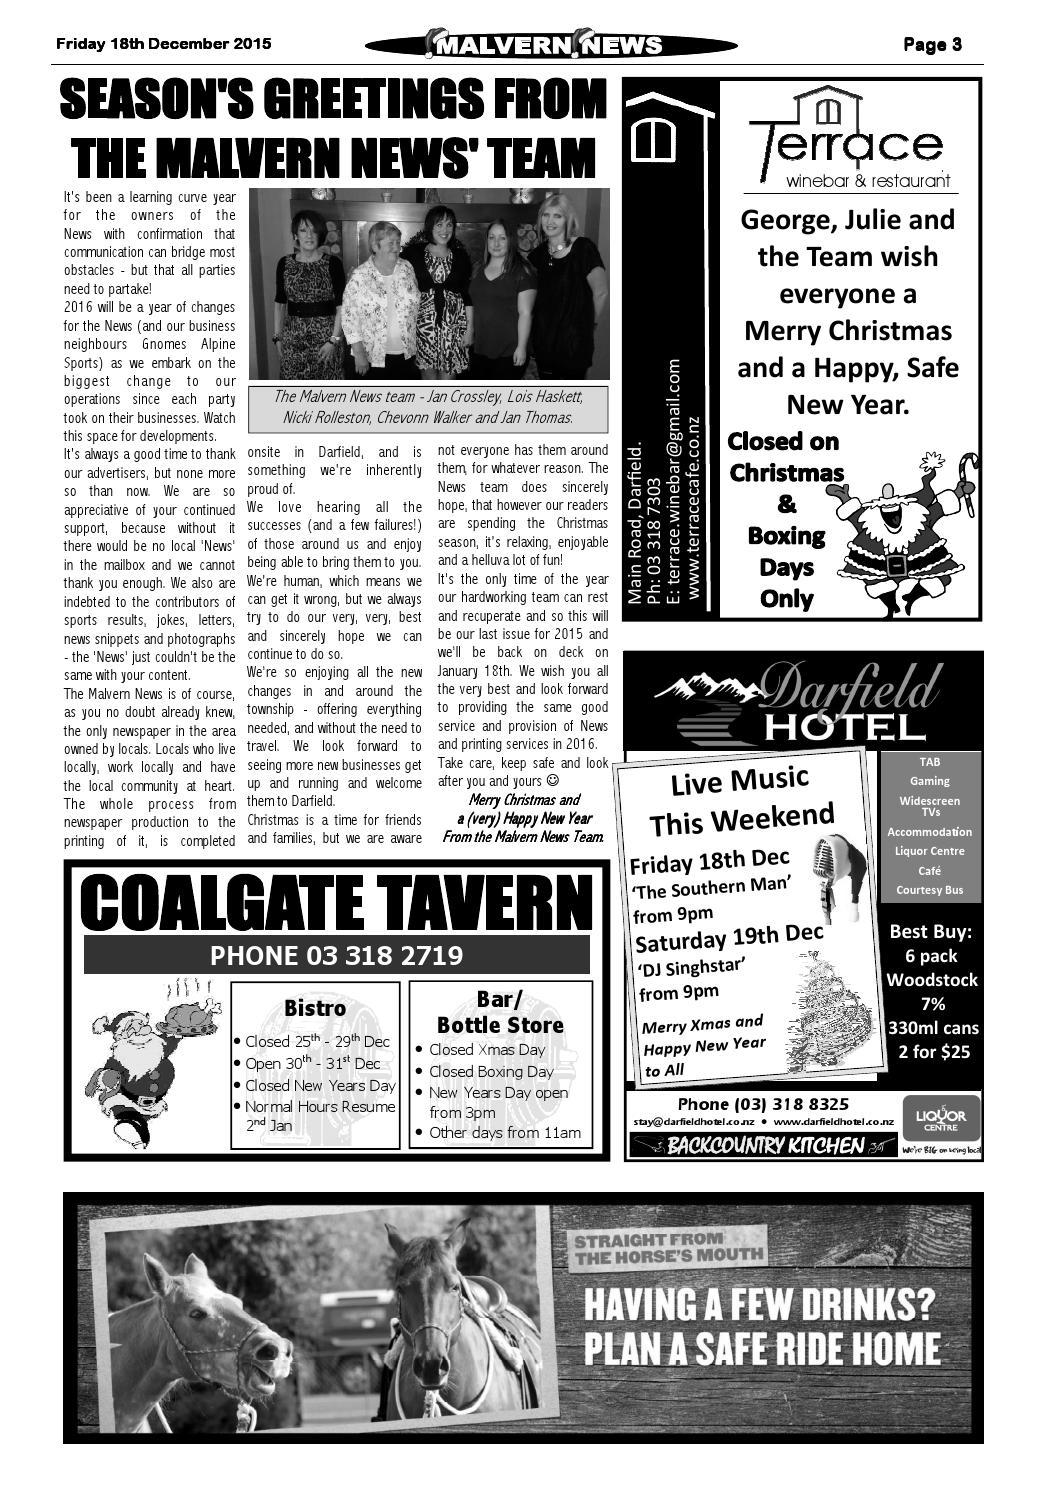 Issue 725 Friday 18th December 2015 by Malvern News - issuu